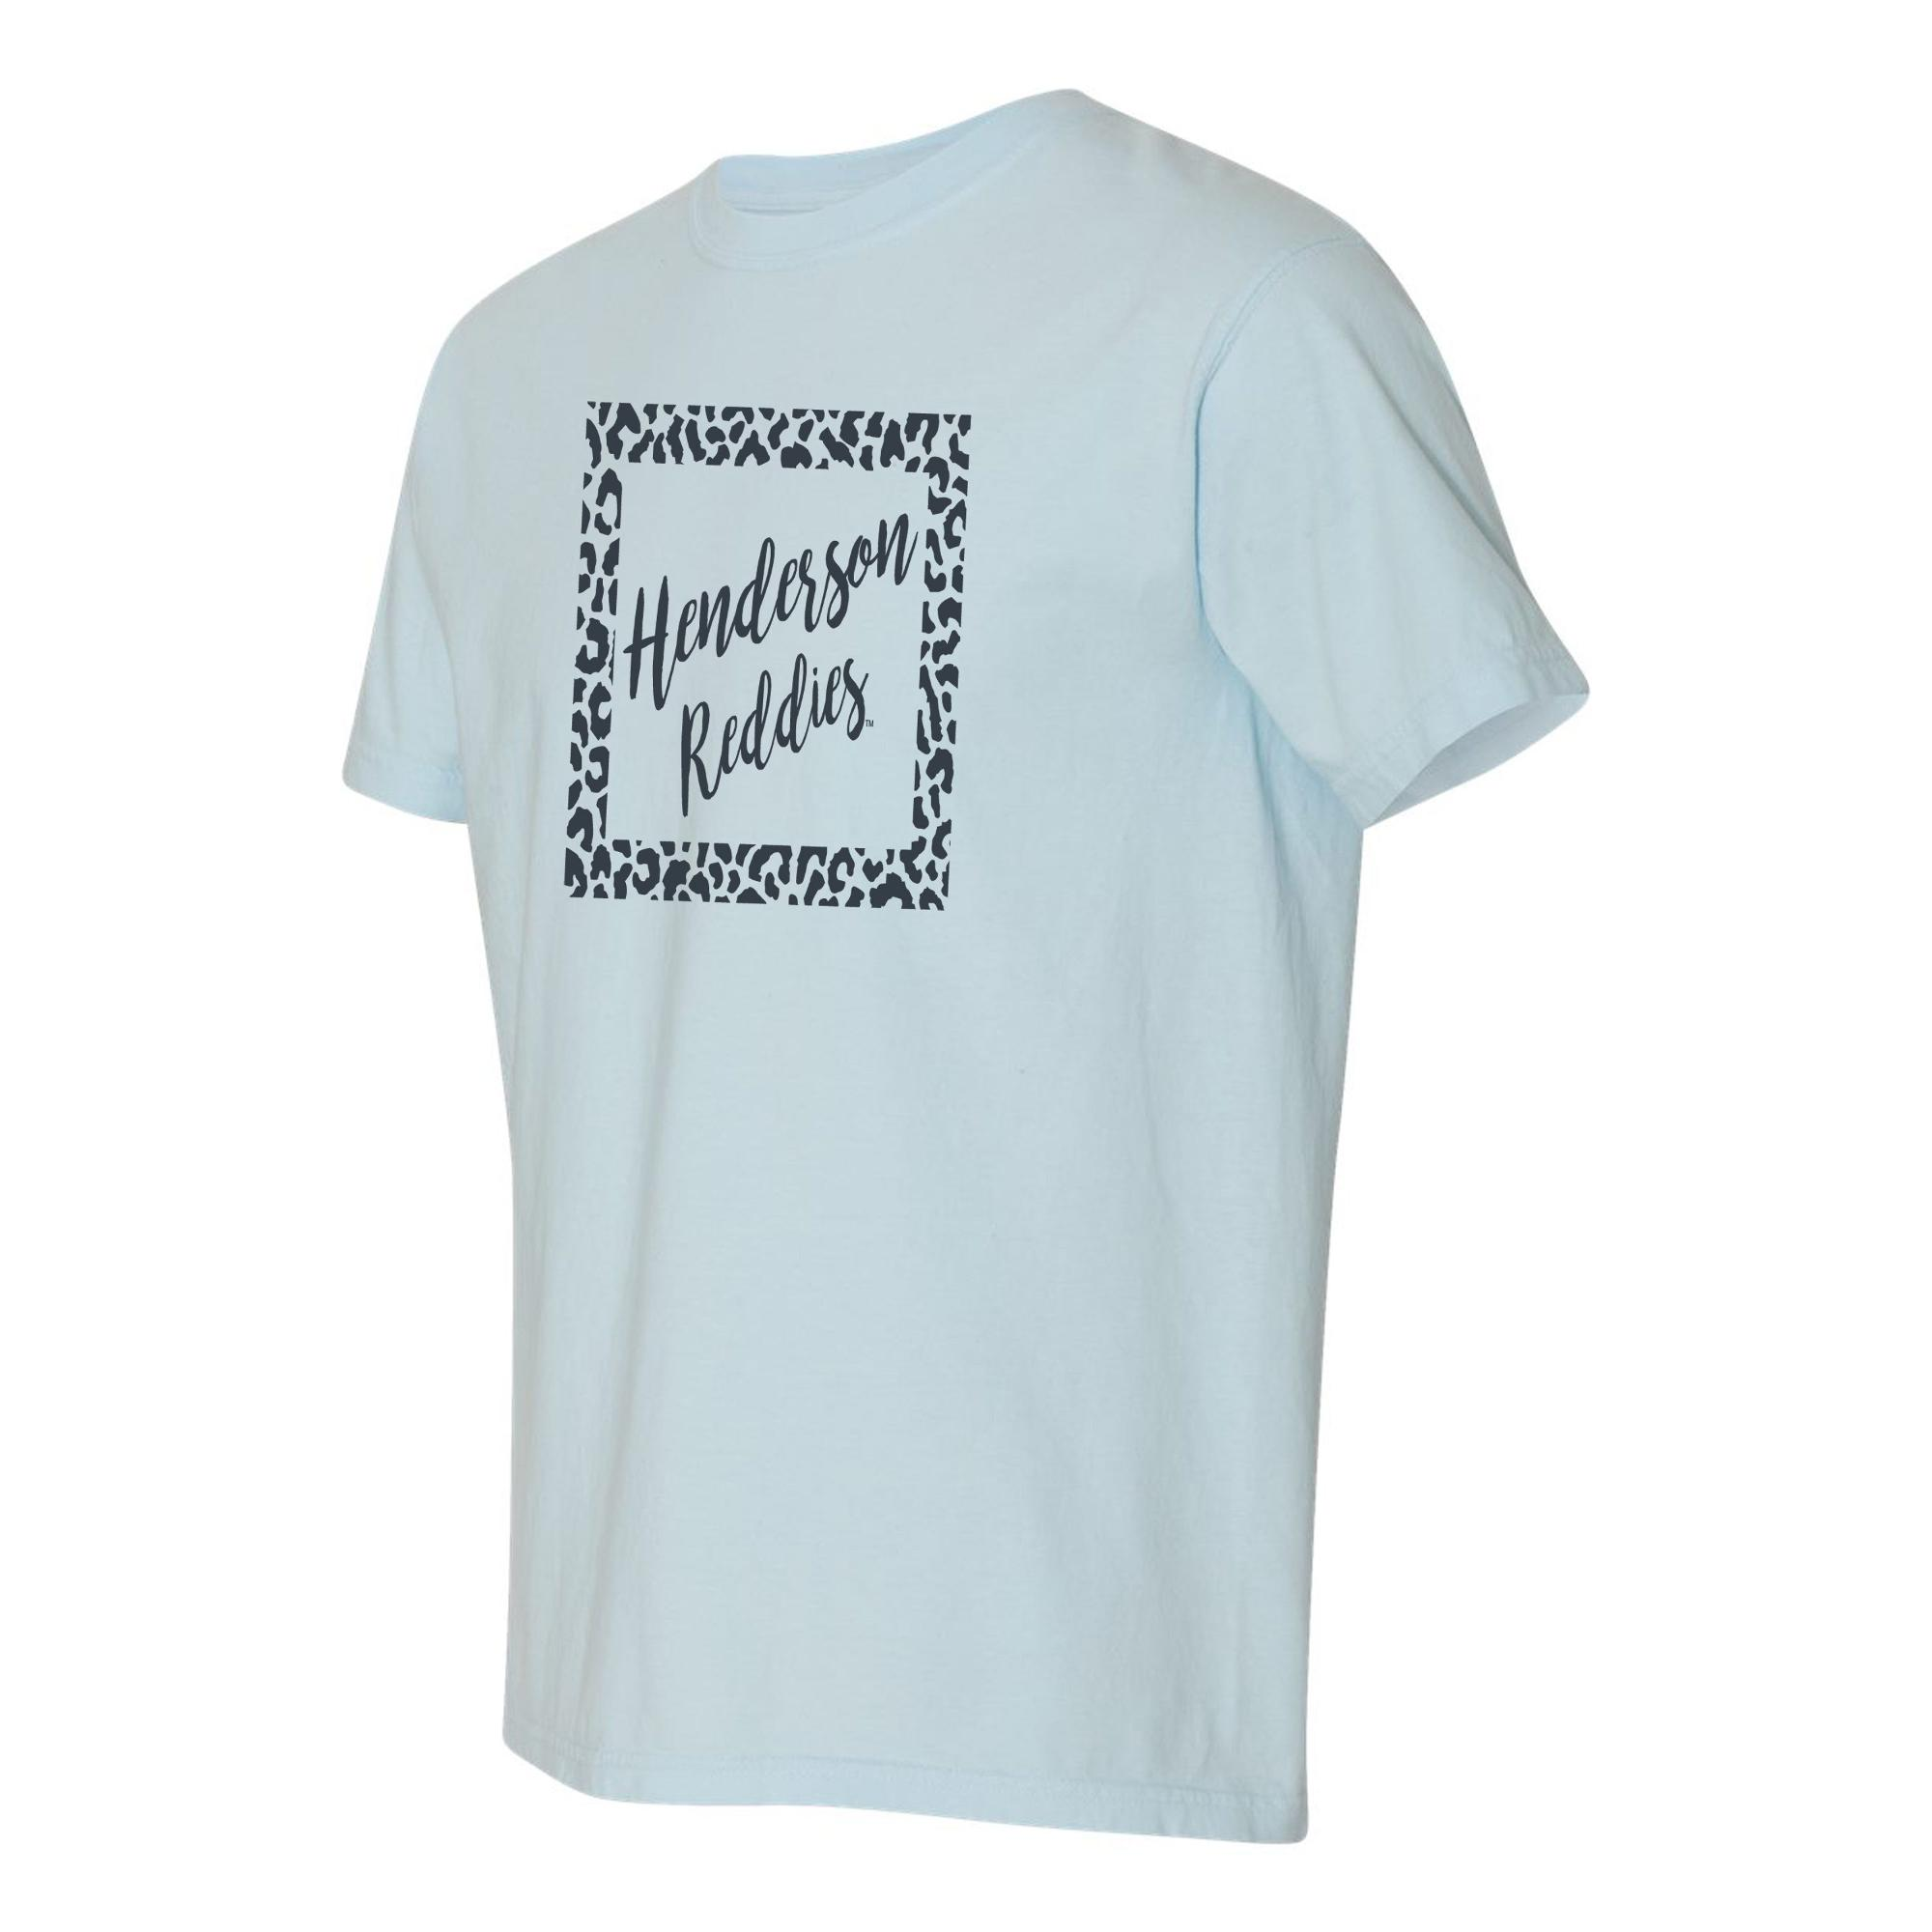 image of: Henderson Reddies Leopard Block Short Sleeve T-Shirt